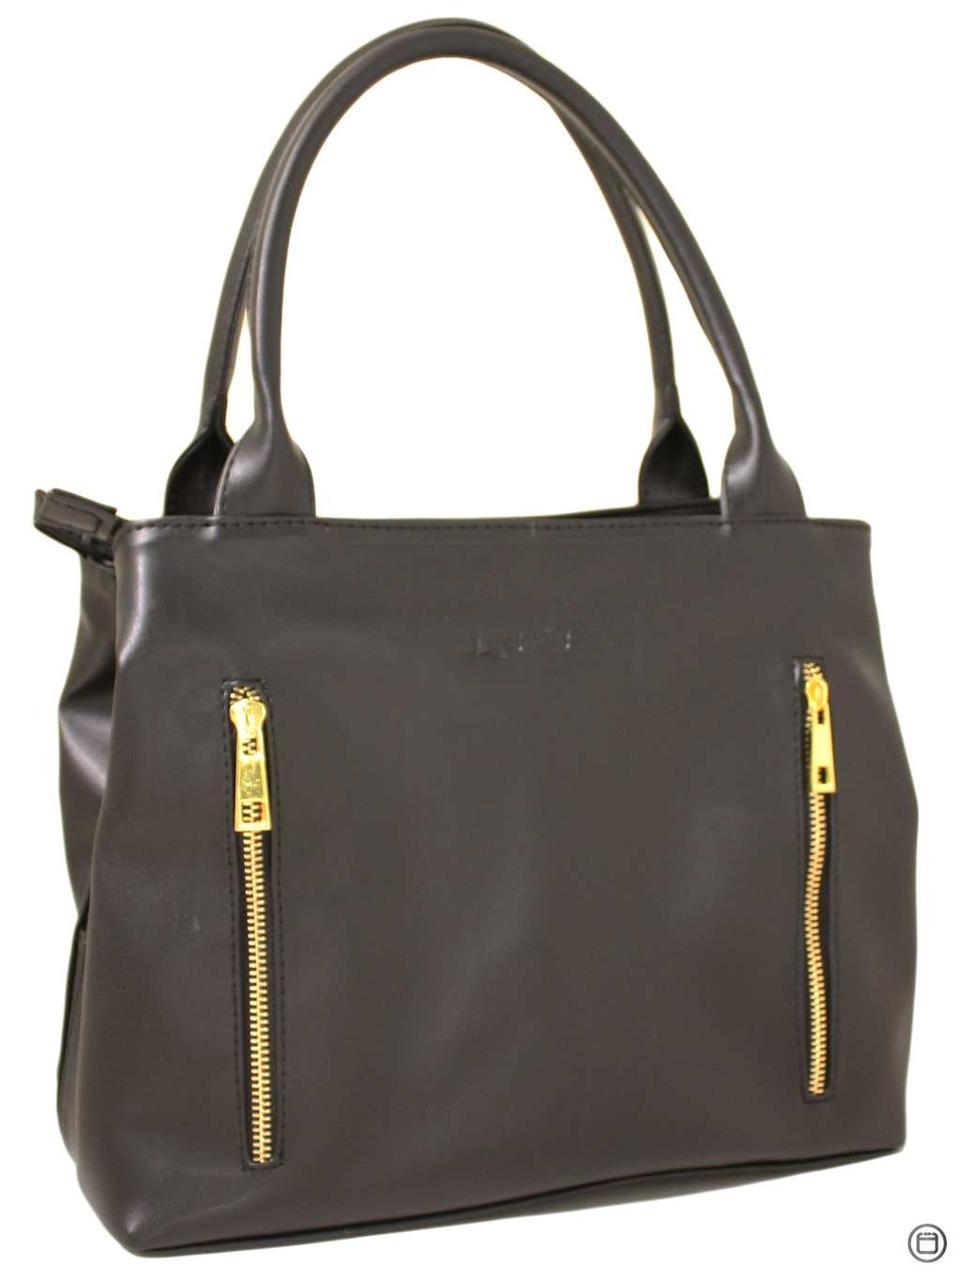 Жіноча сумка зі шкірозамінника Україна 507 чорна г